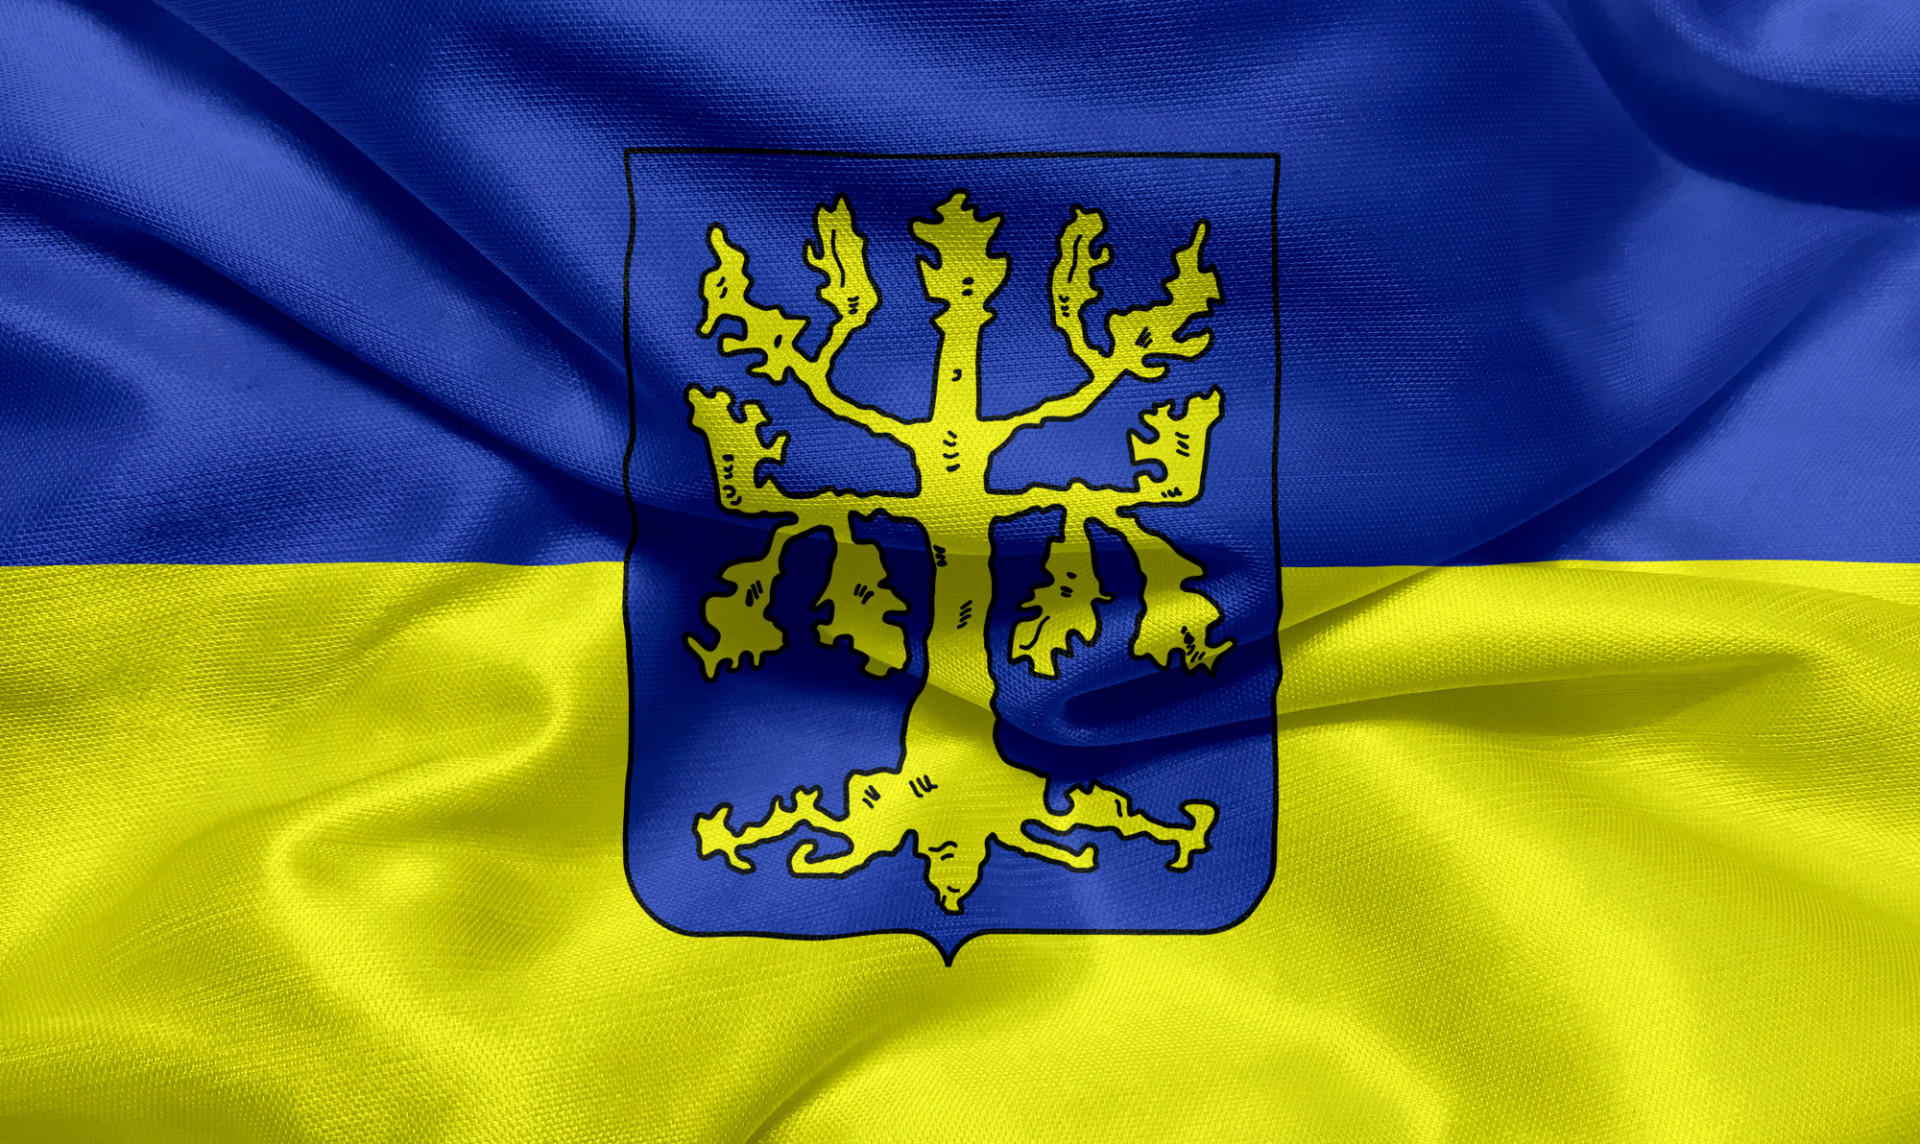 Flag of the city of Hagen